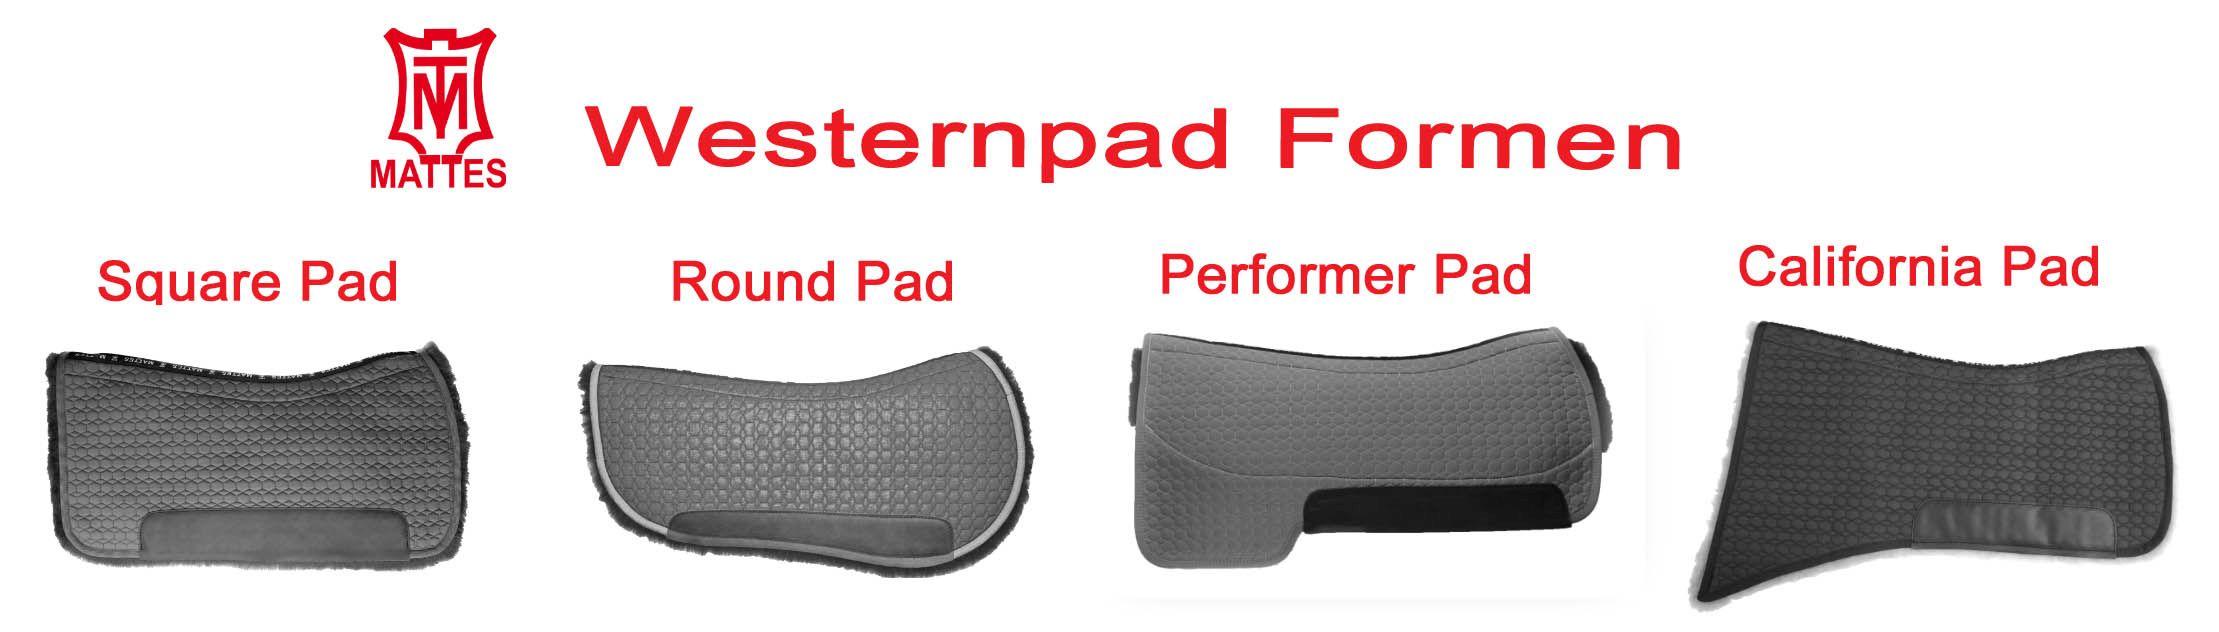 Mattes Westernpads - verschiedene Formen